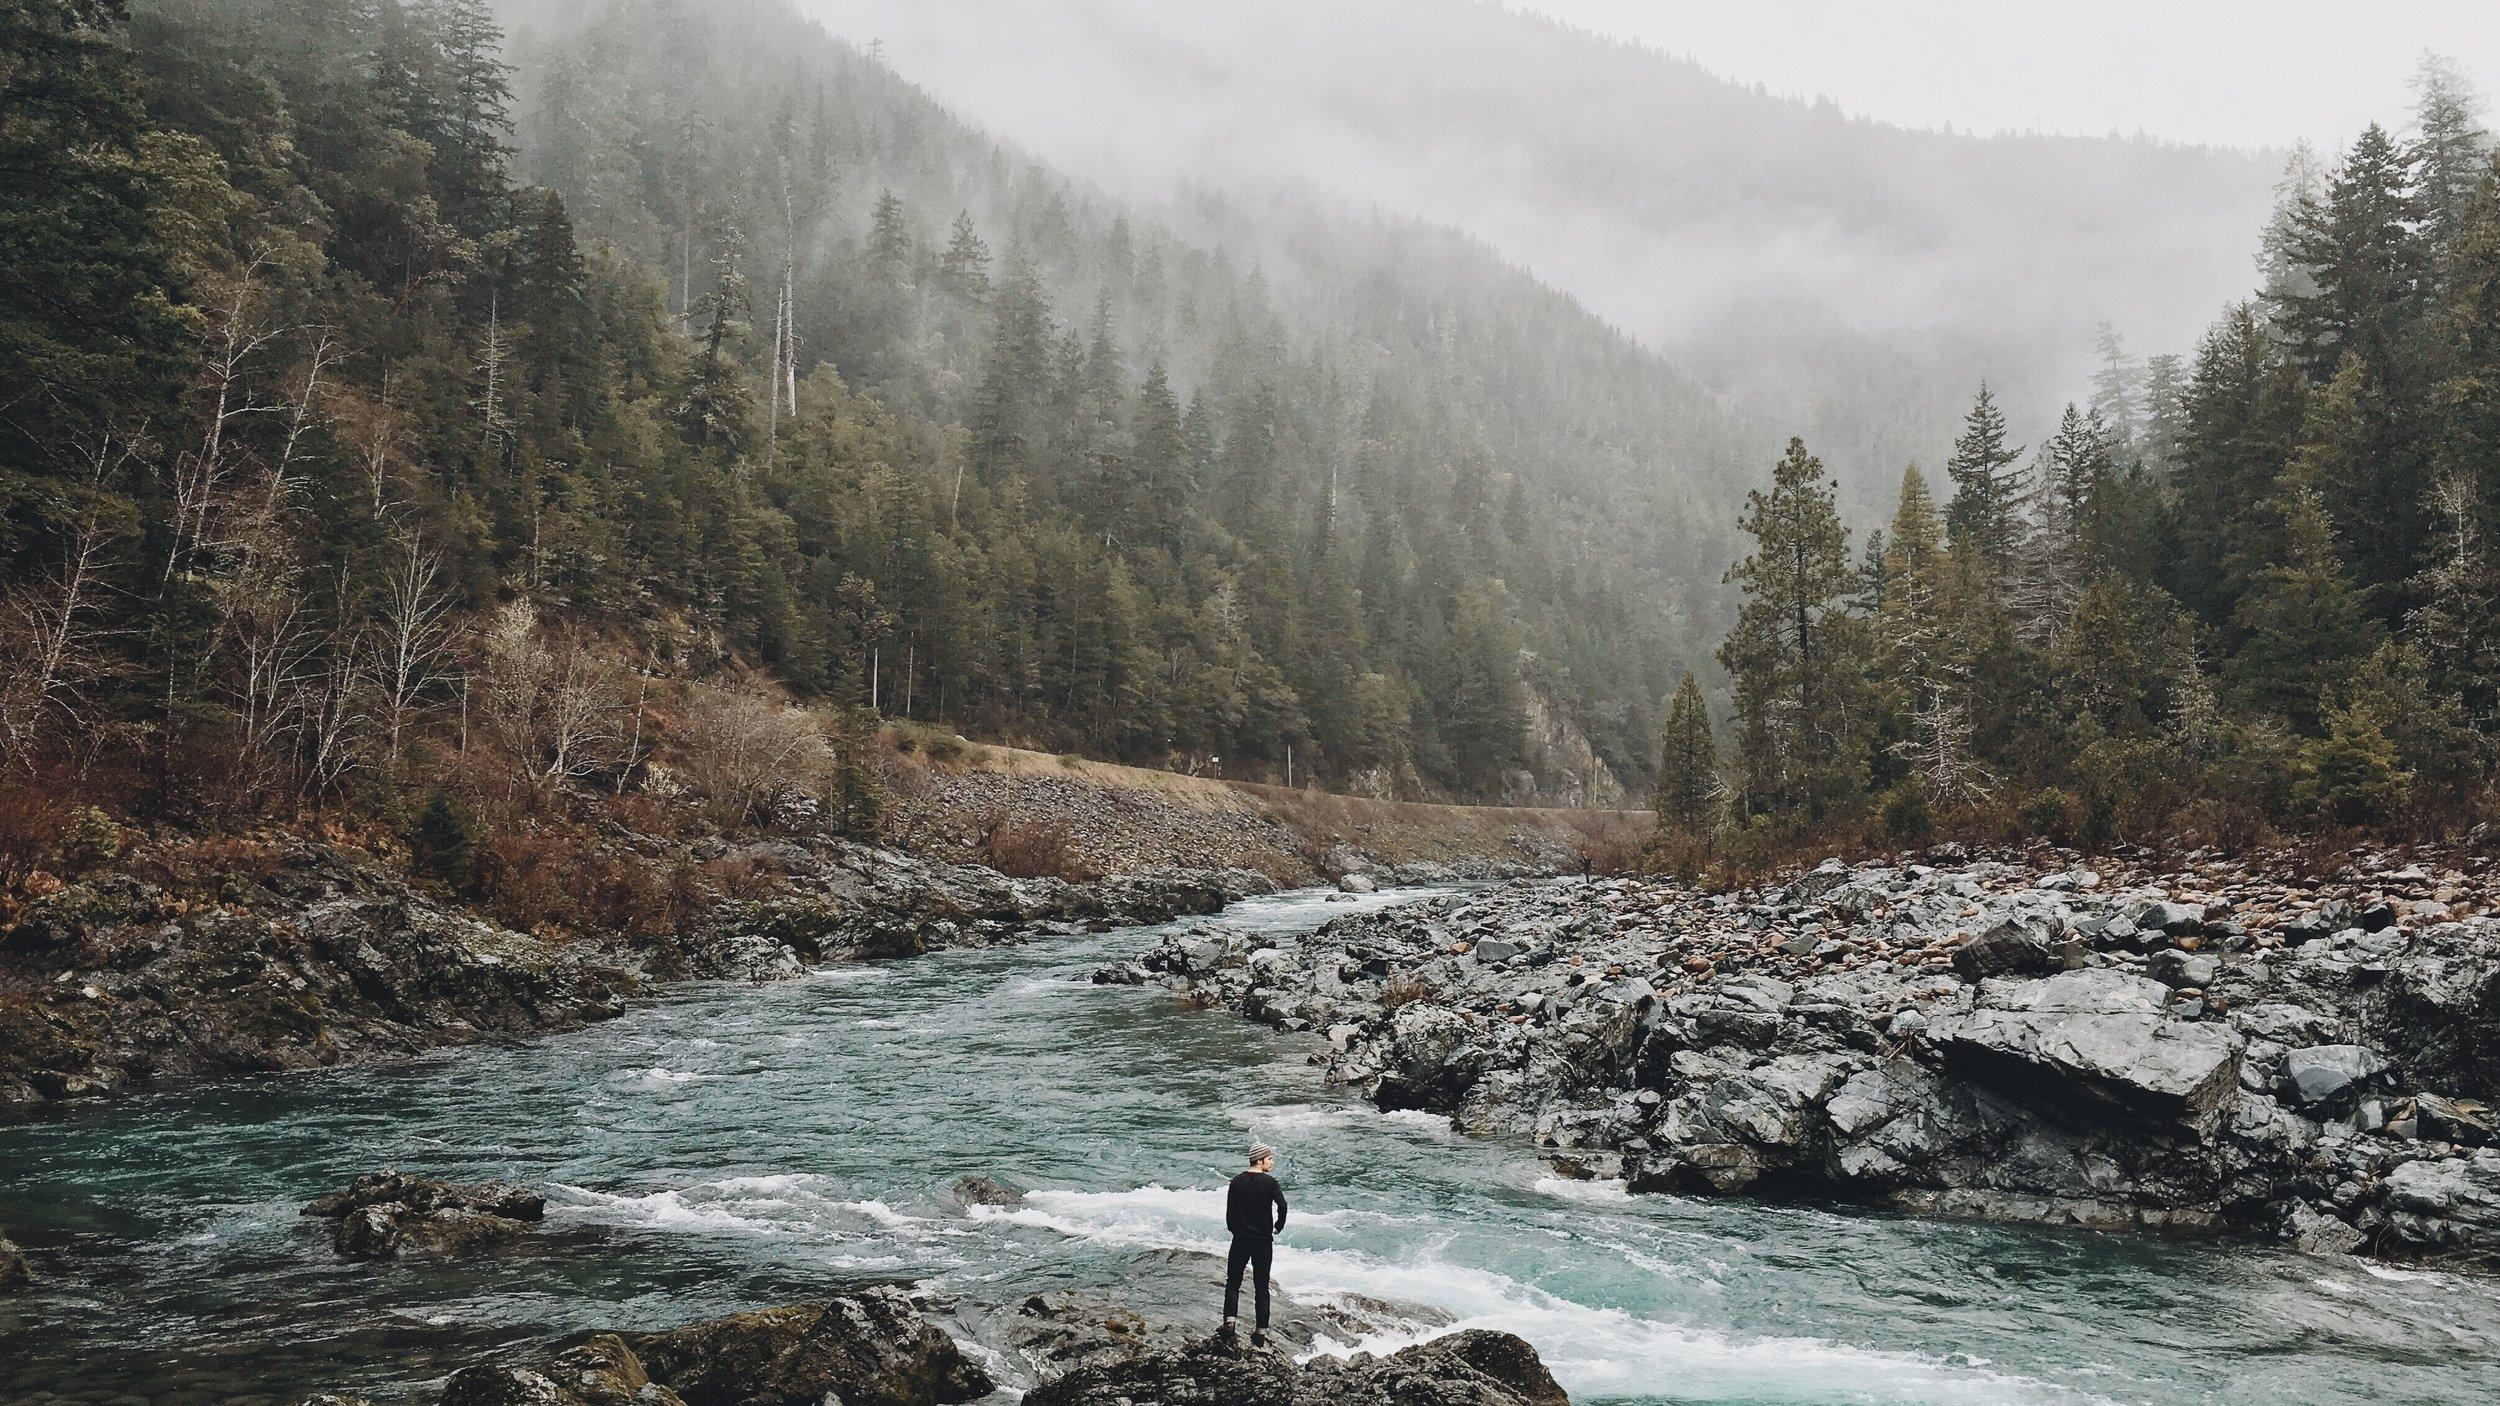 Edgewater Christian Fellowship - Grants Pass, Oregon